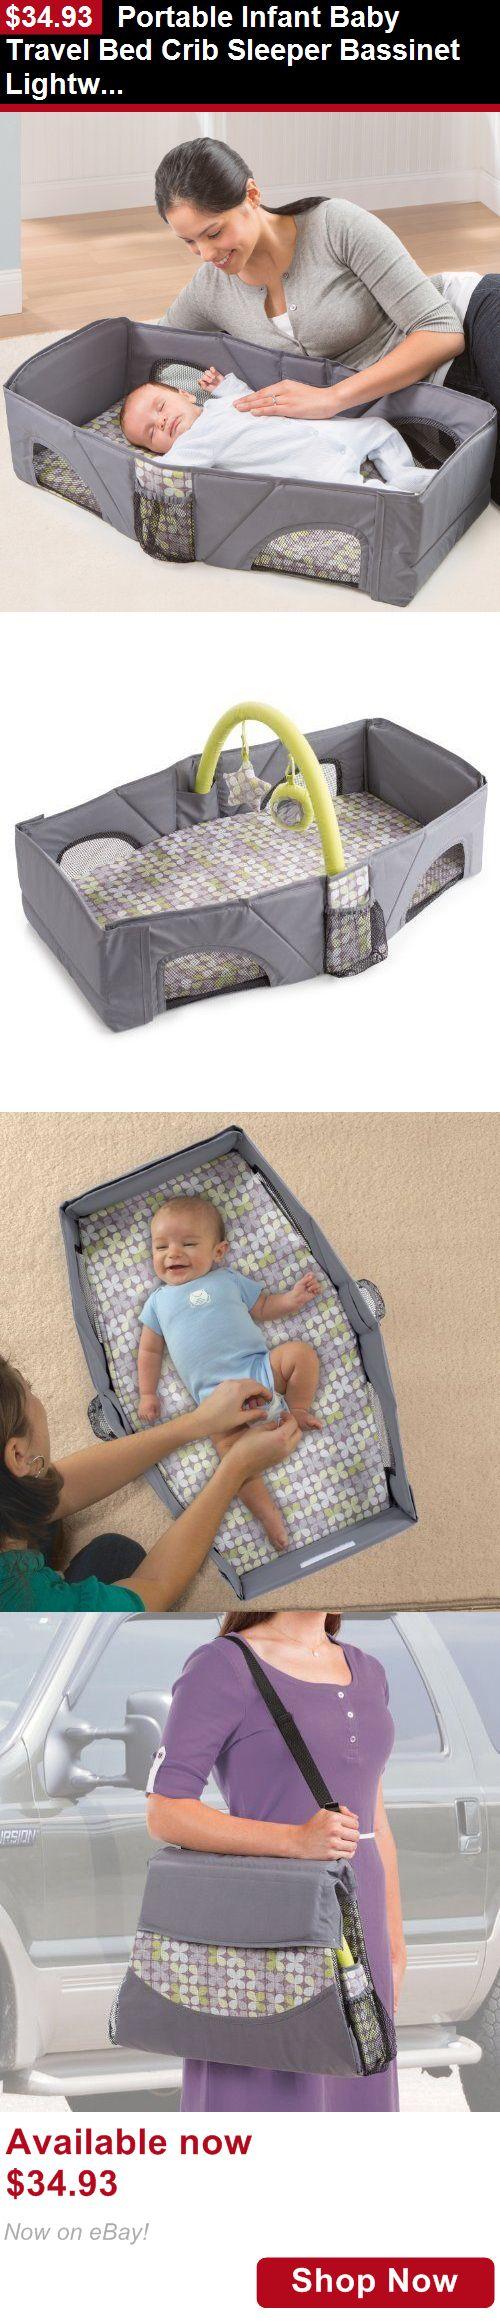 Baby Co Sleepers Portable Infant Travel Bed Crib Sleeper Bassinet Lightweight Diaper Changer